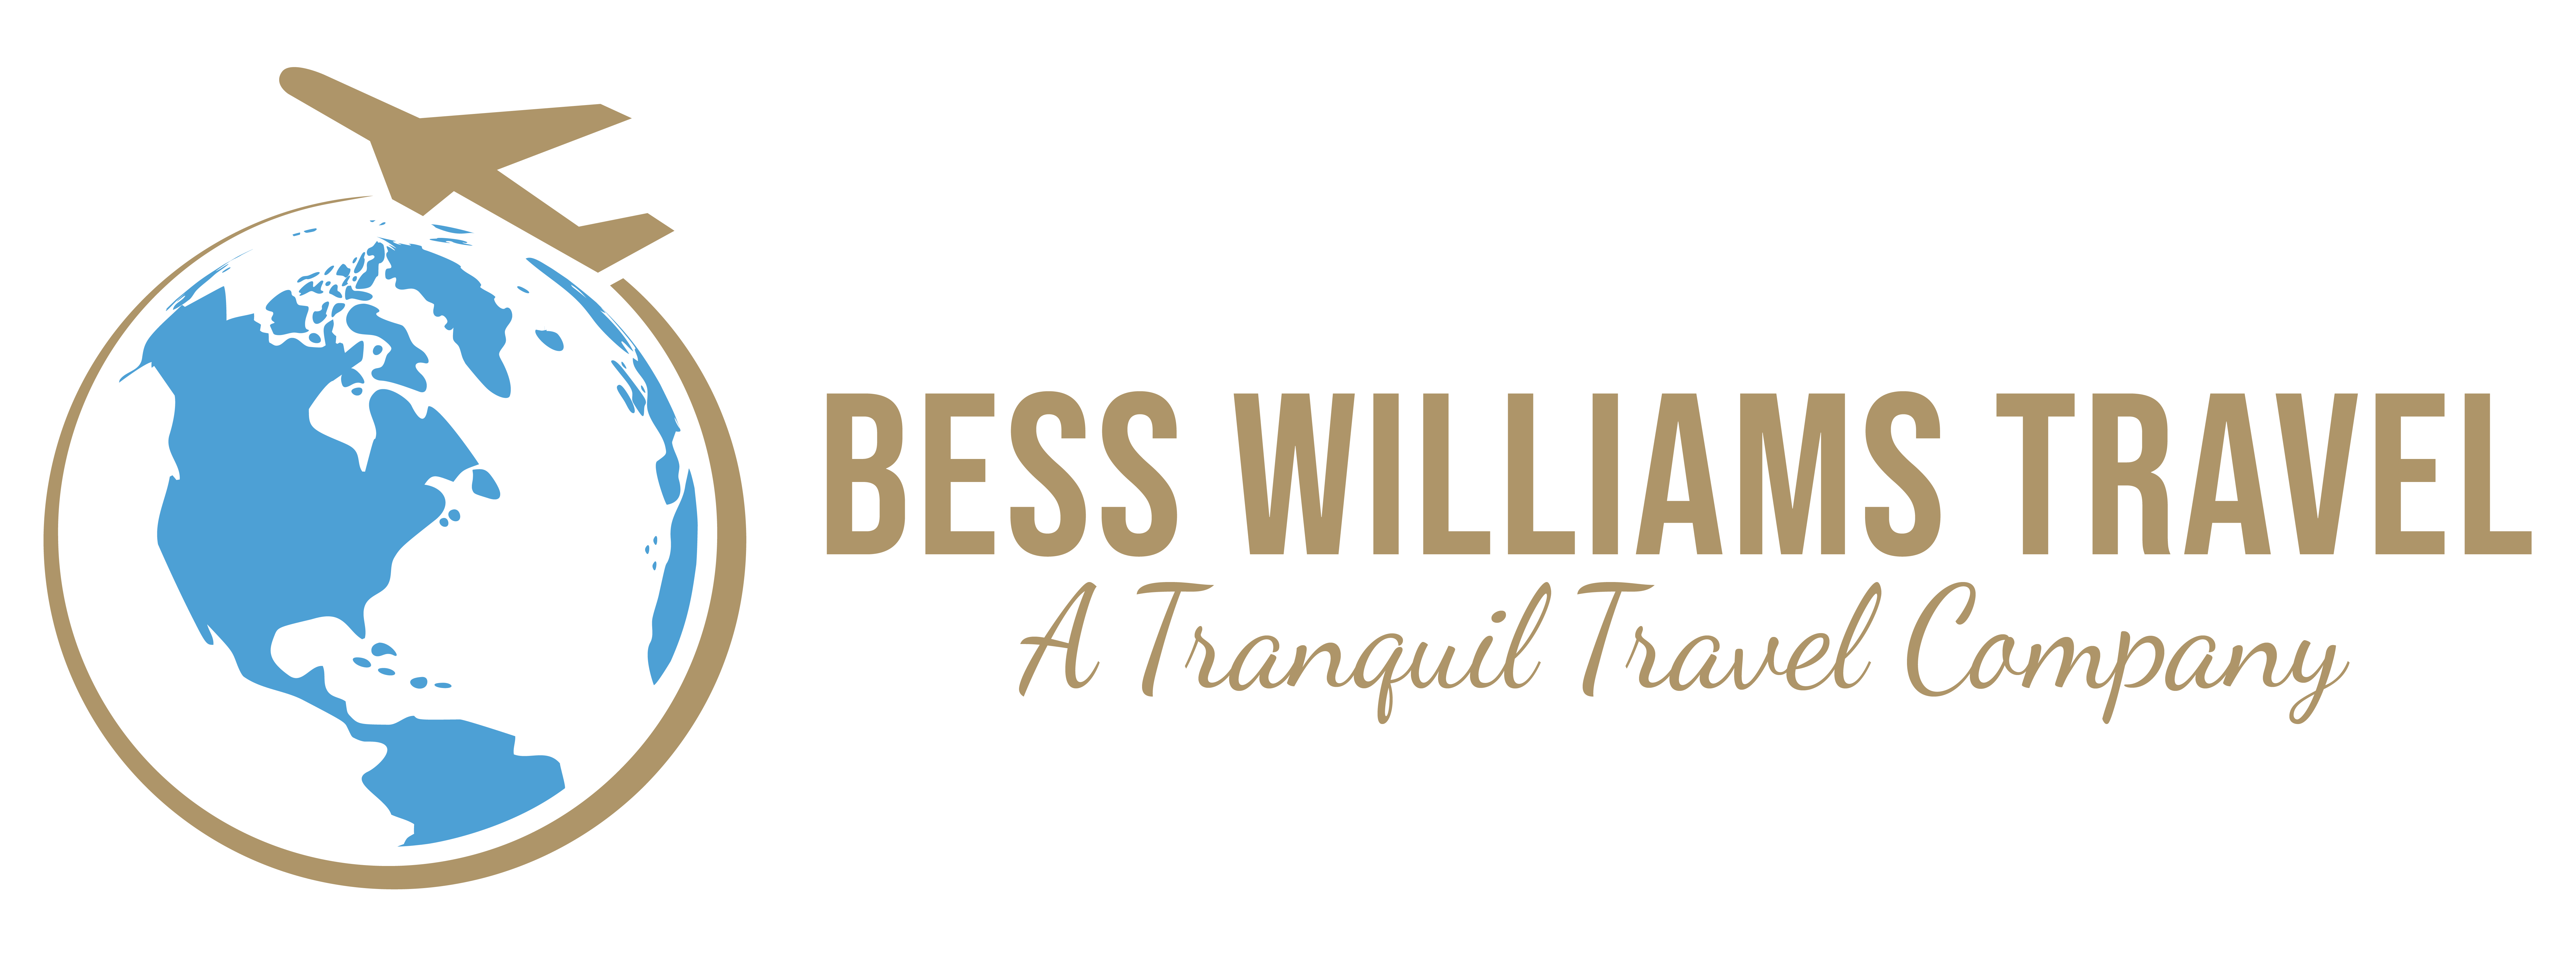 Bess Williams Travel